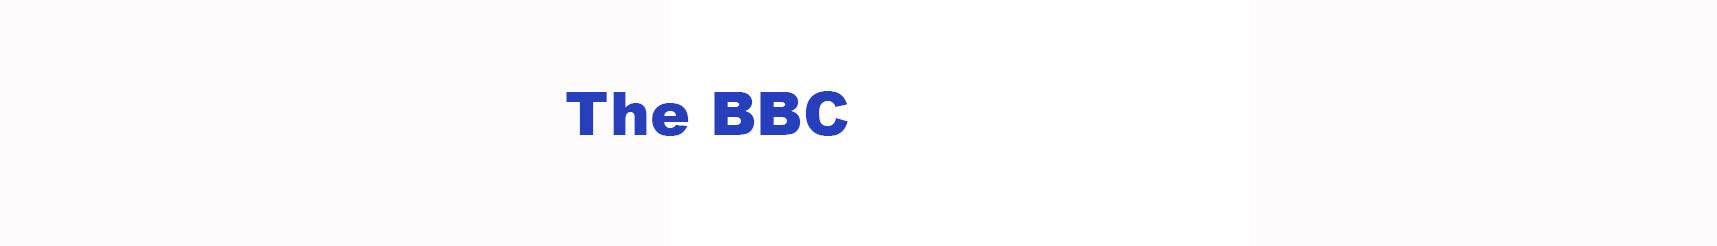 аббревиатуры с большой буквы